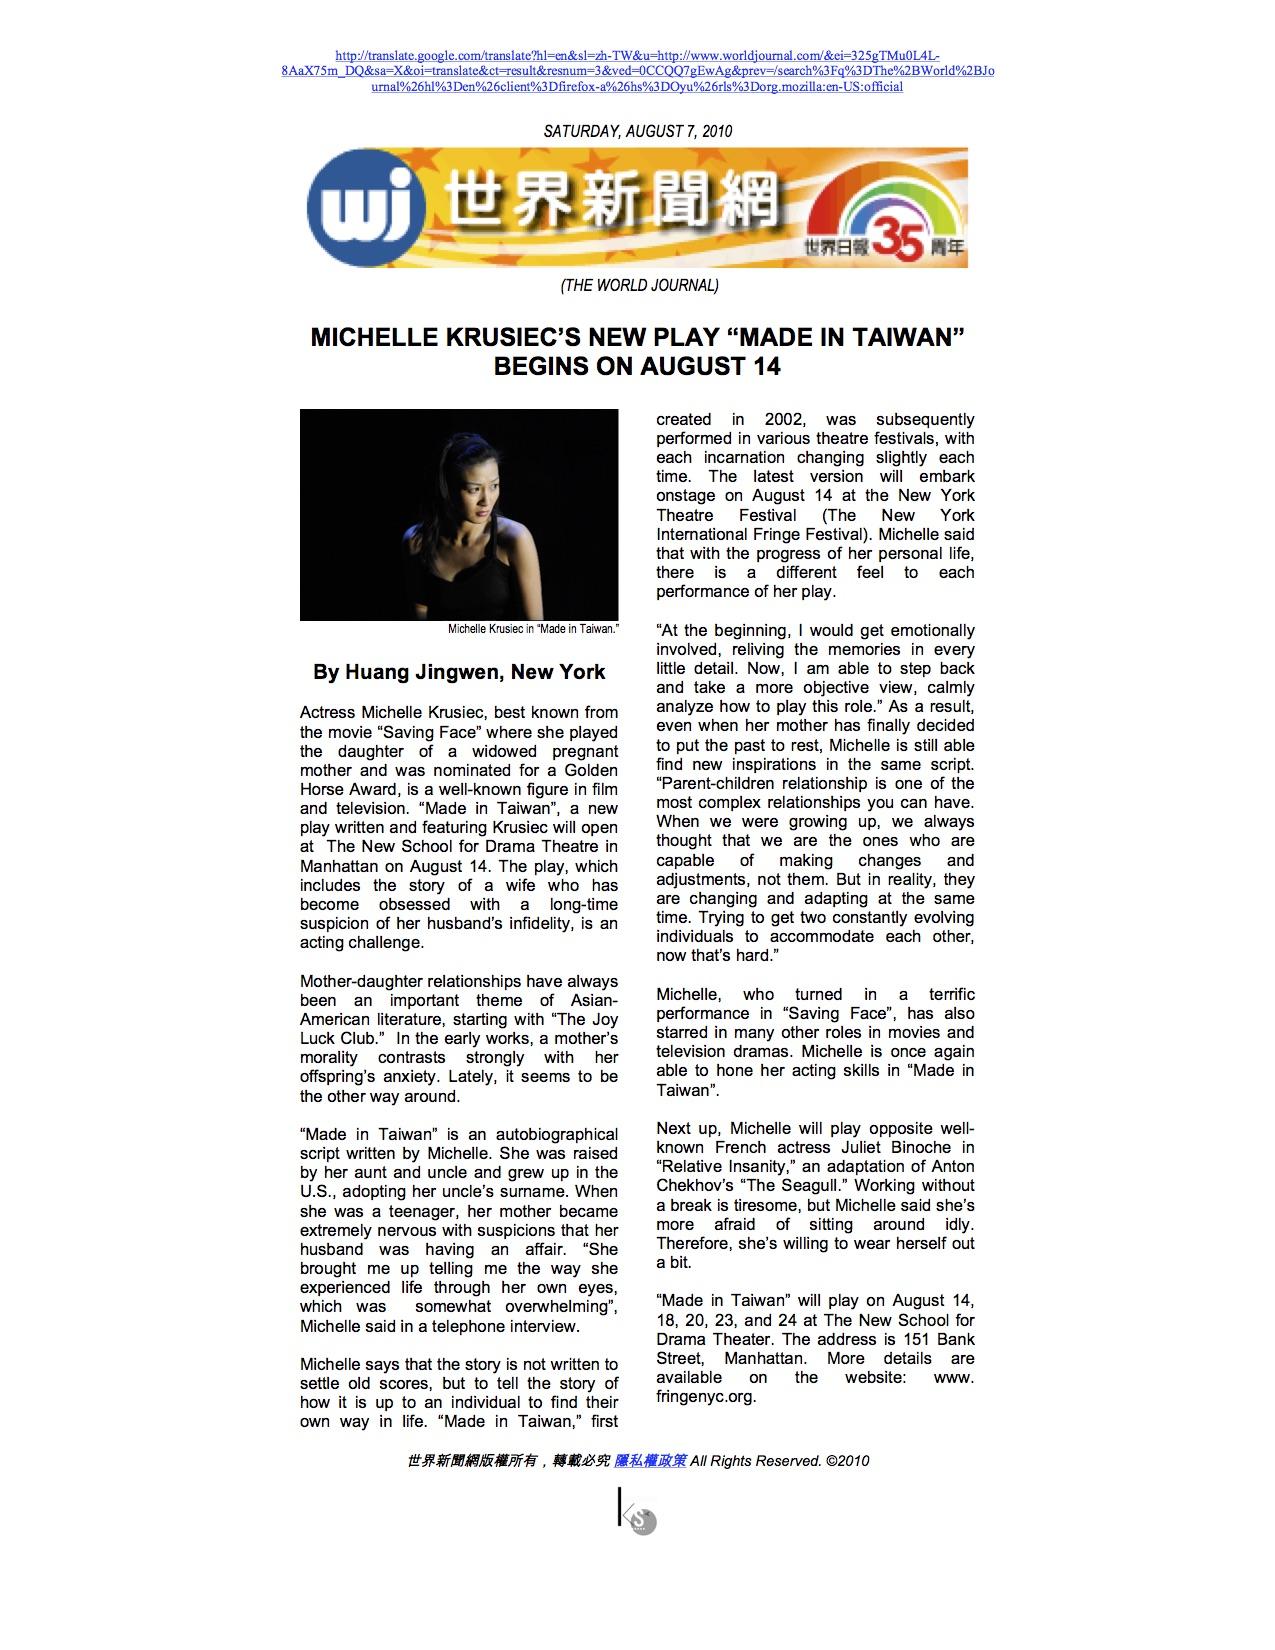 WORLD JOURNAL 8-7-10 Page 2